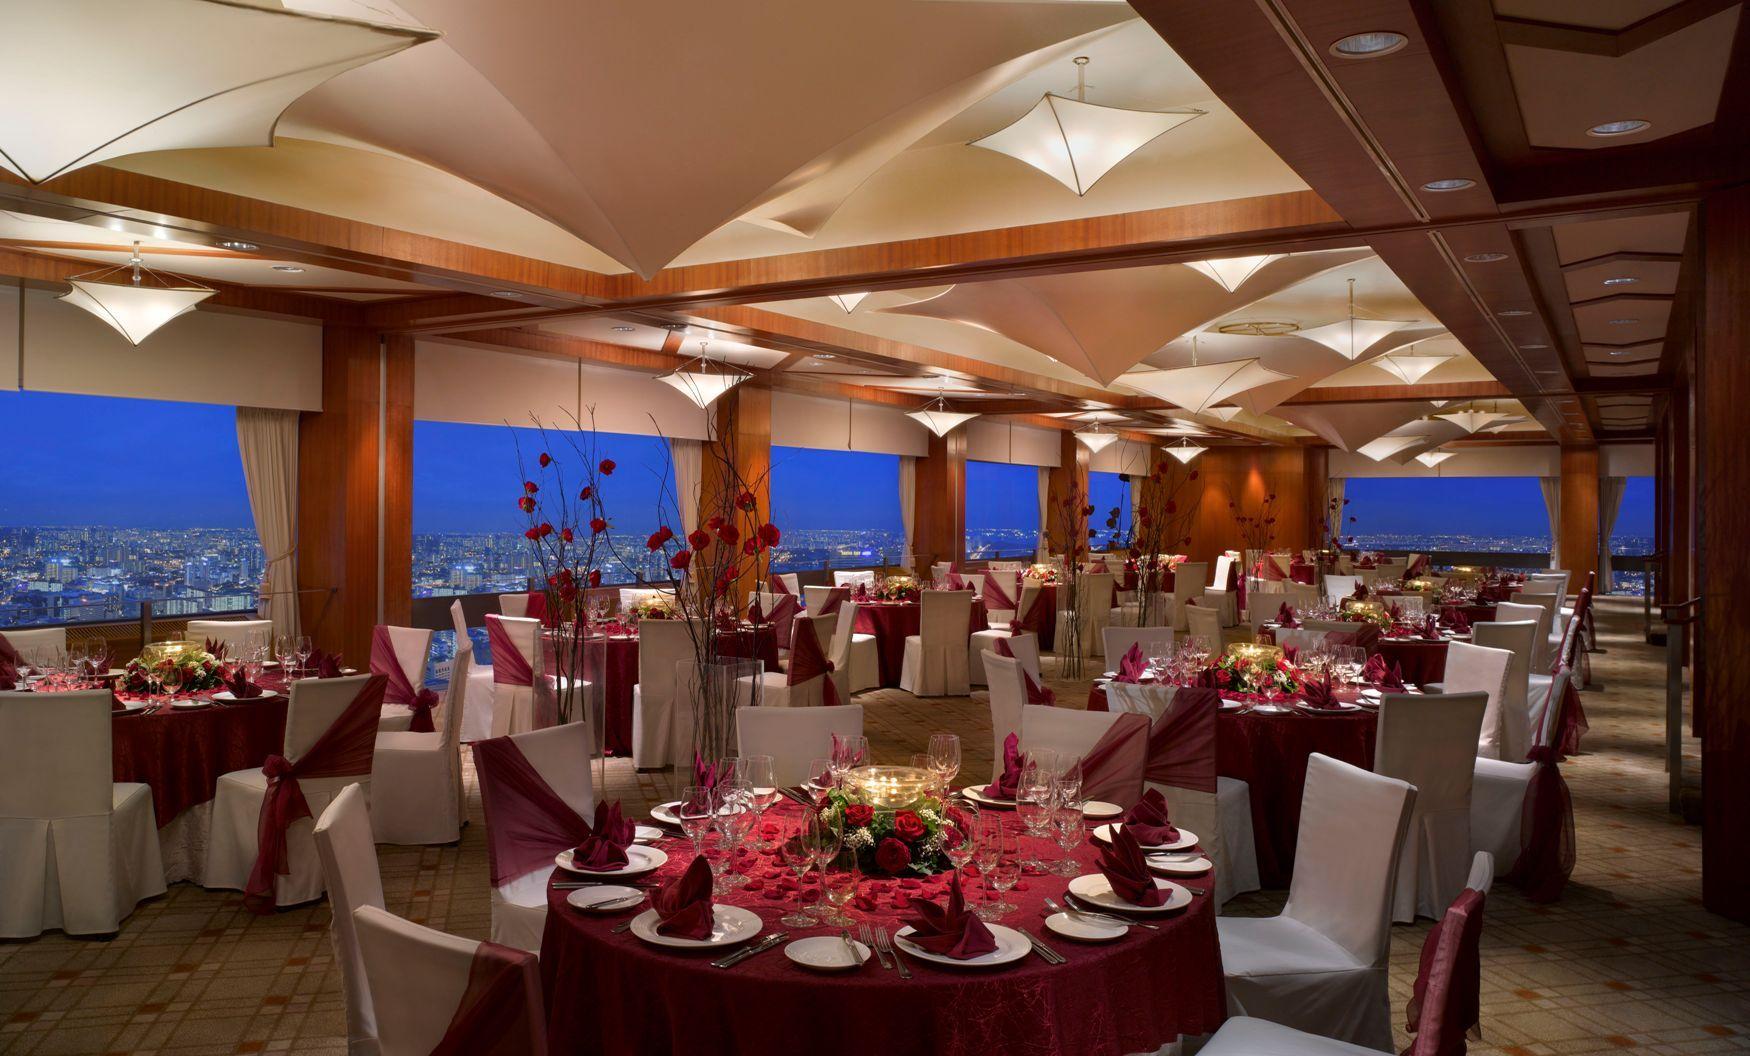 Botanic Garden Villa Halia Singapore Wedding Venues Pinterest Equinox Private Dining Room